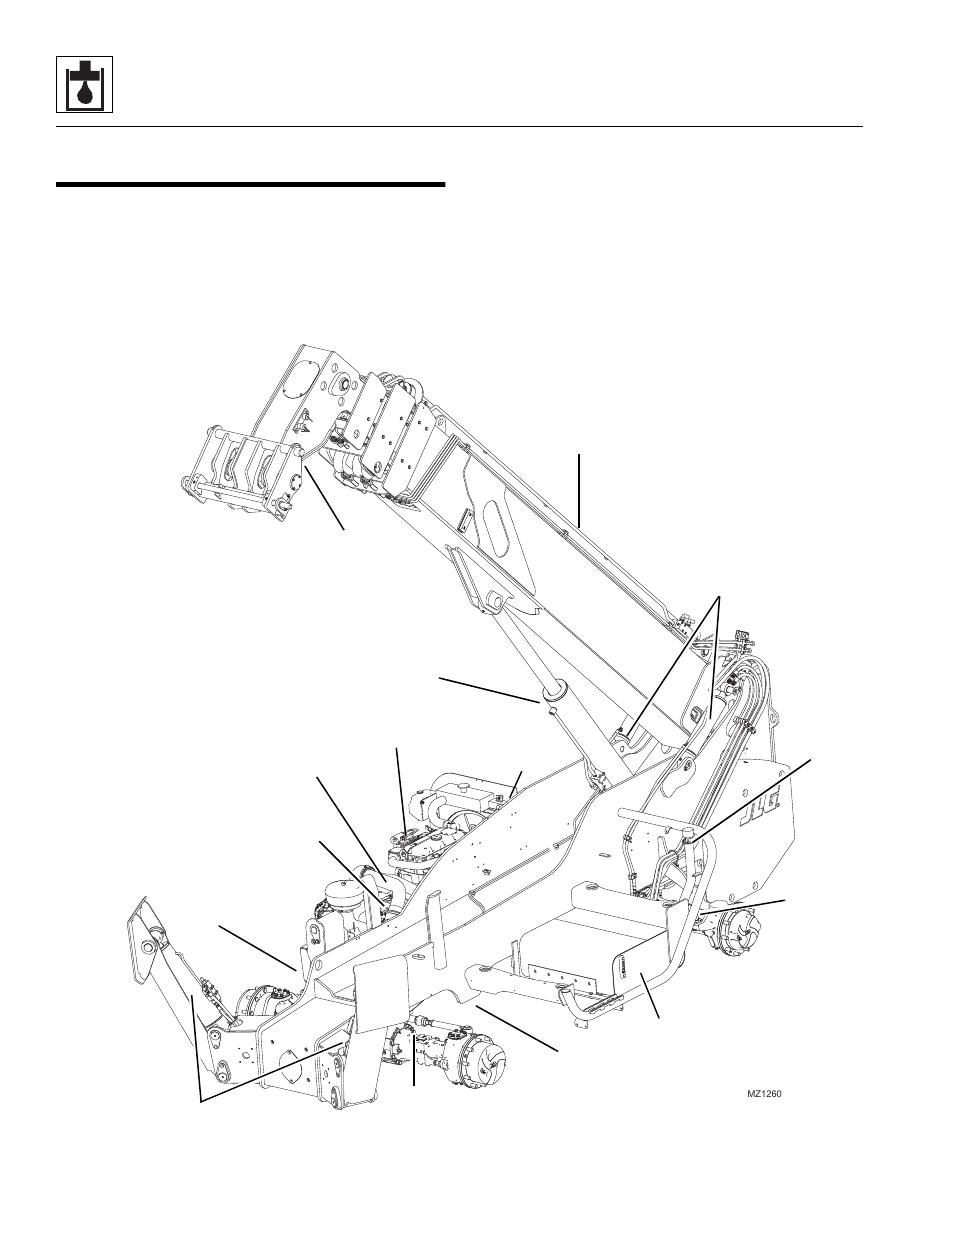 medium resolution of jlg cm2023 wiring diagram wiring diagram h8jlg cm2023 wiring diagram wiring diagram z4 jlg cm2023 wiring